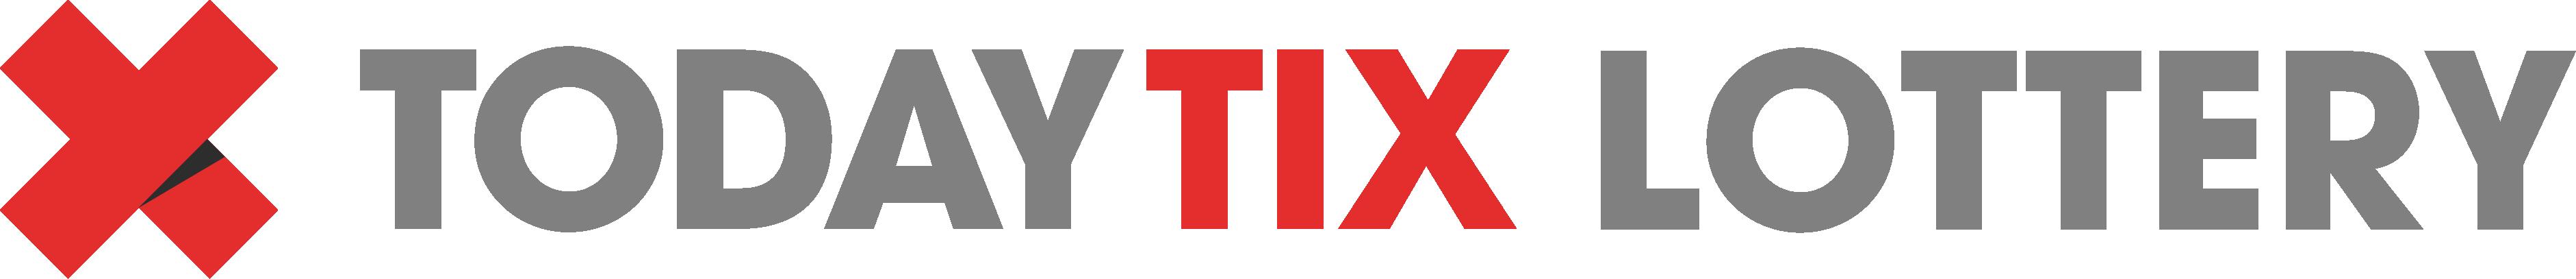 TodayTix Lottery logo